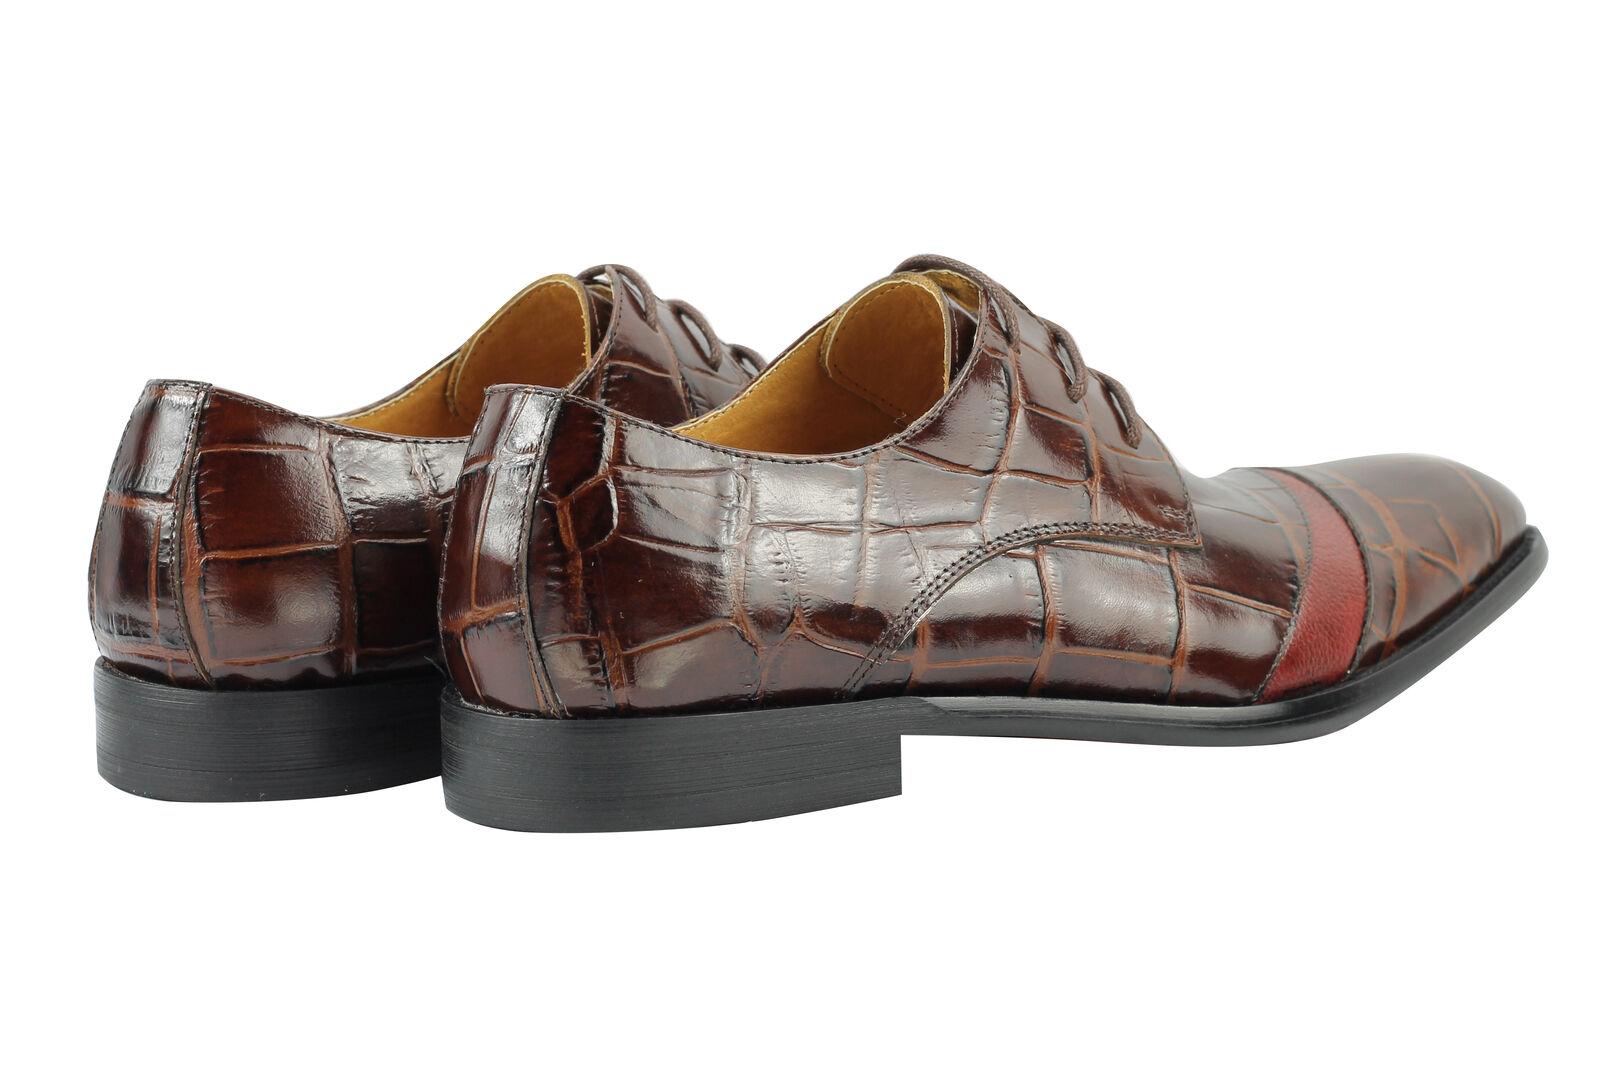 Braun Uomo Real Genuine Leder Braun  Crocodile Skin Effect Smart Dress Lace up Schuhes 2314b4